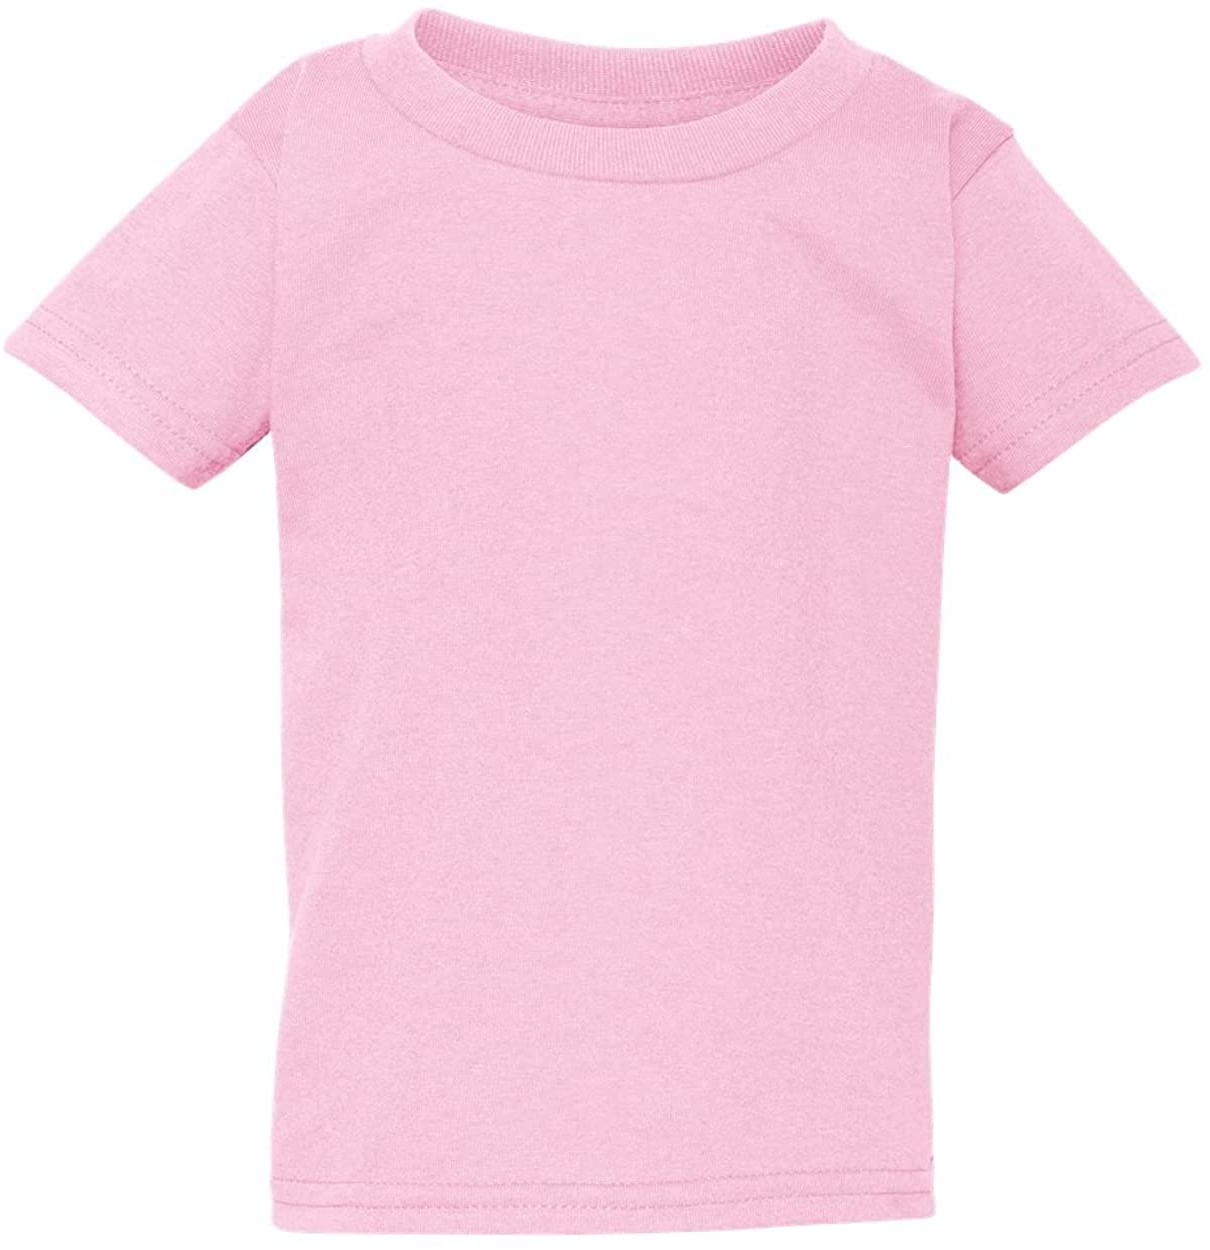 G510P T-Shirt Gildan Heavy Cotton 5.3 oz